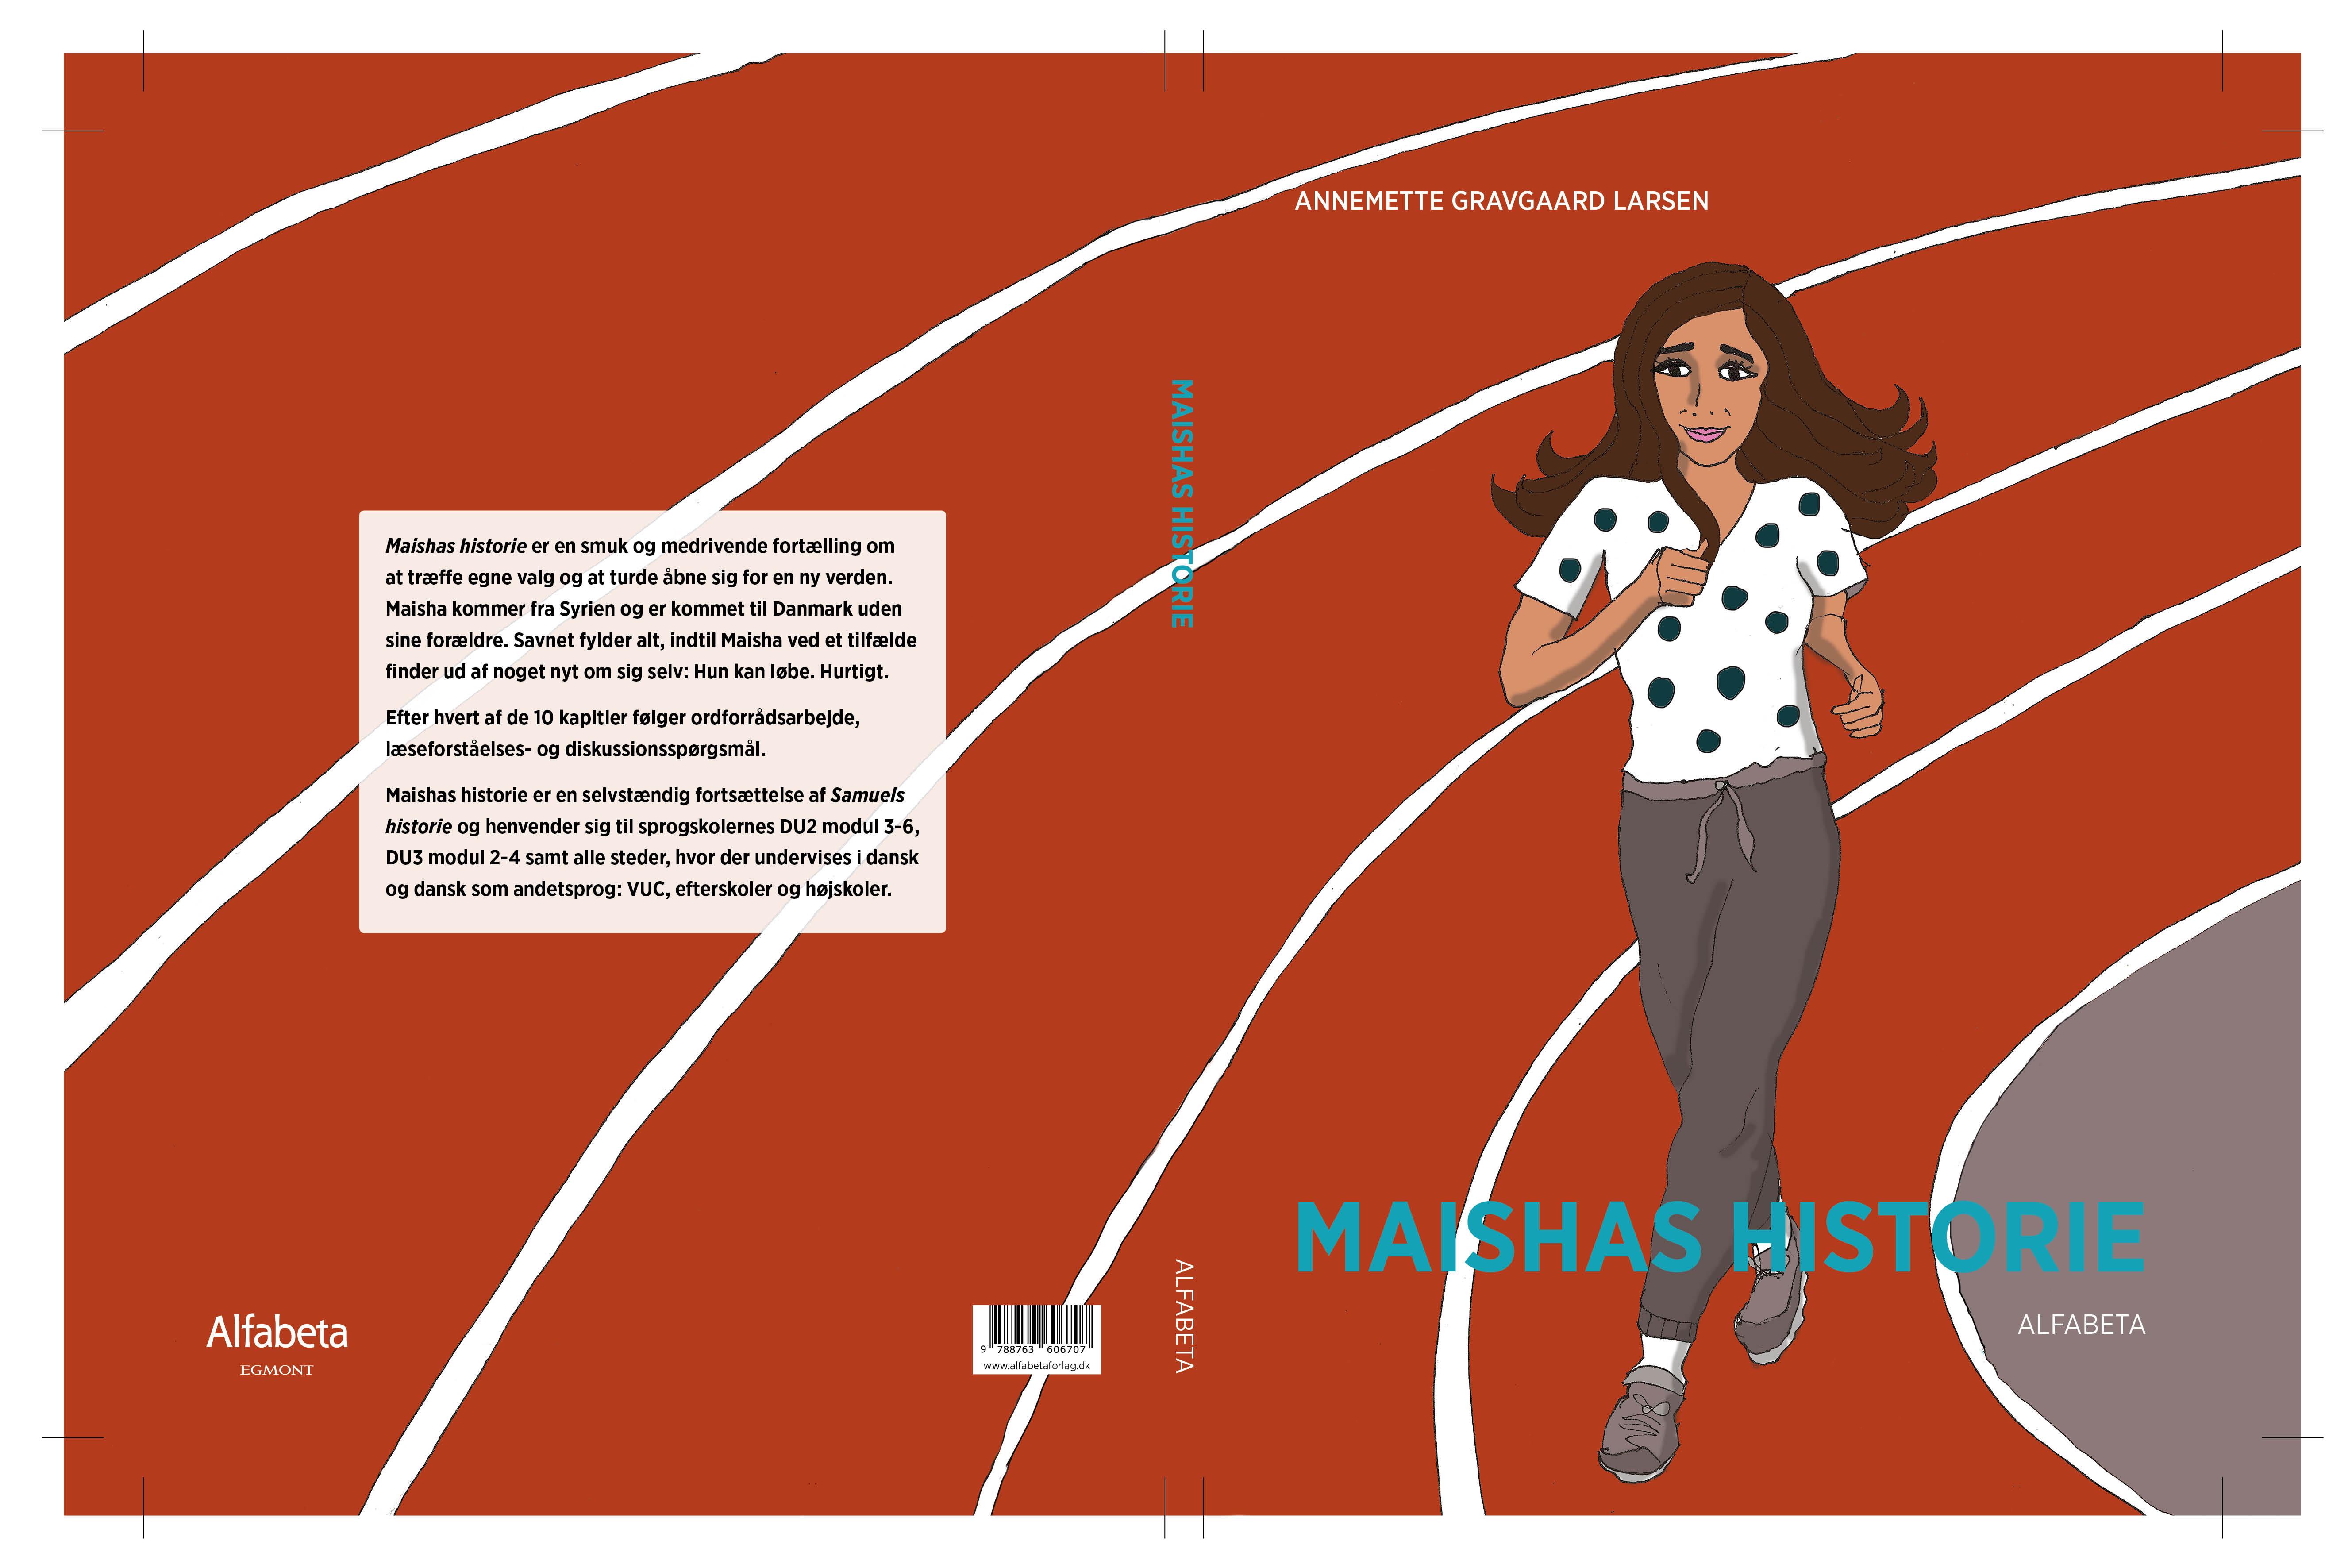 Maisha_historie_omslag_TRYK